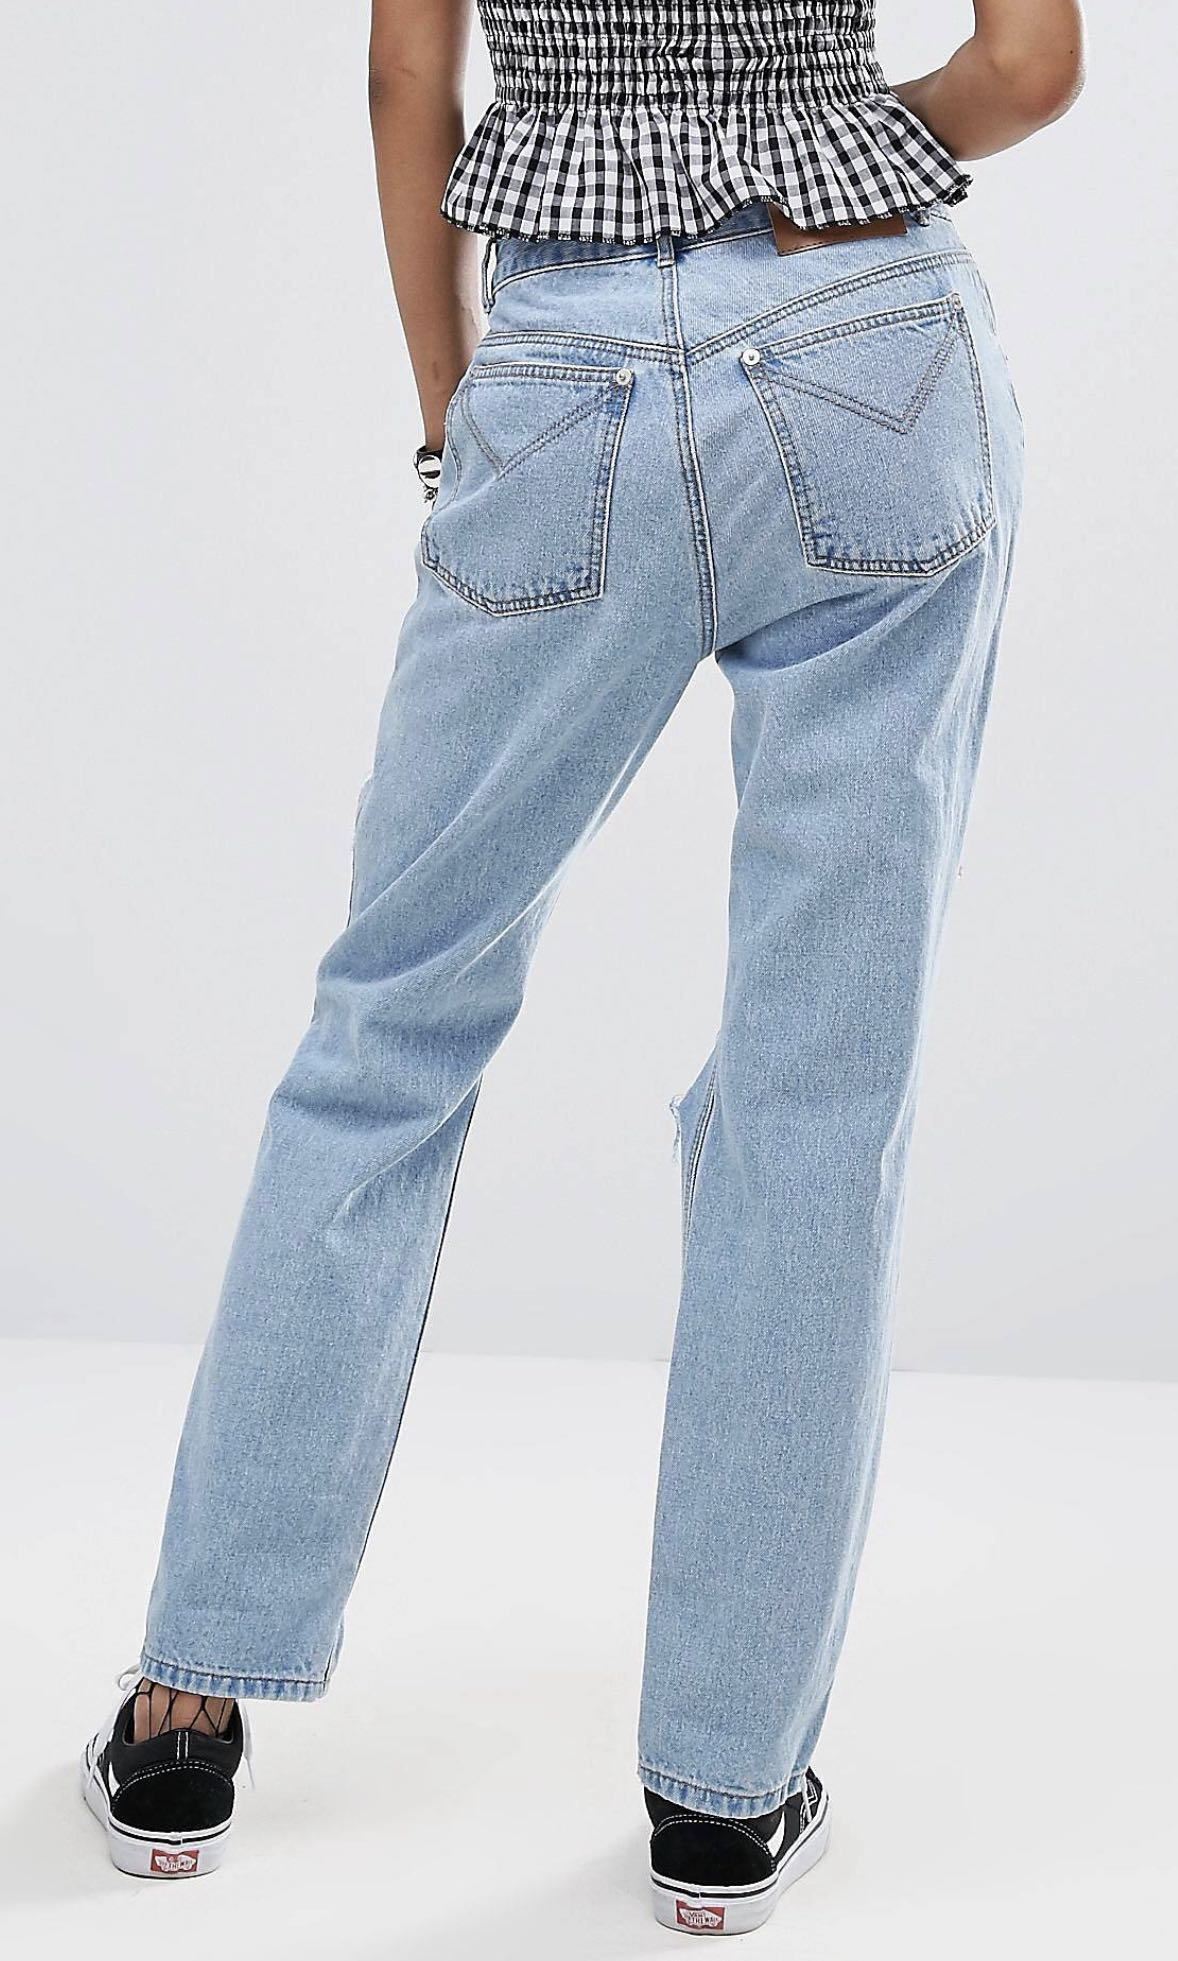 Tear drop ripped jeans size S